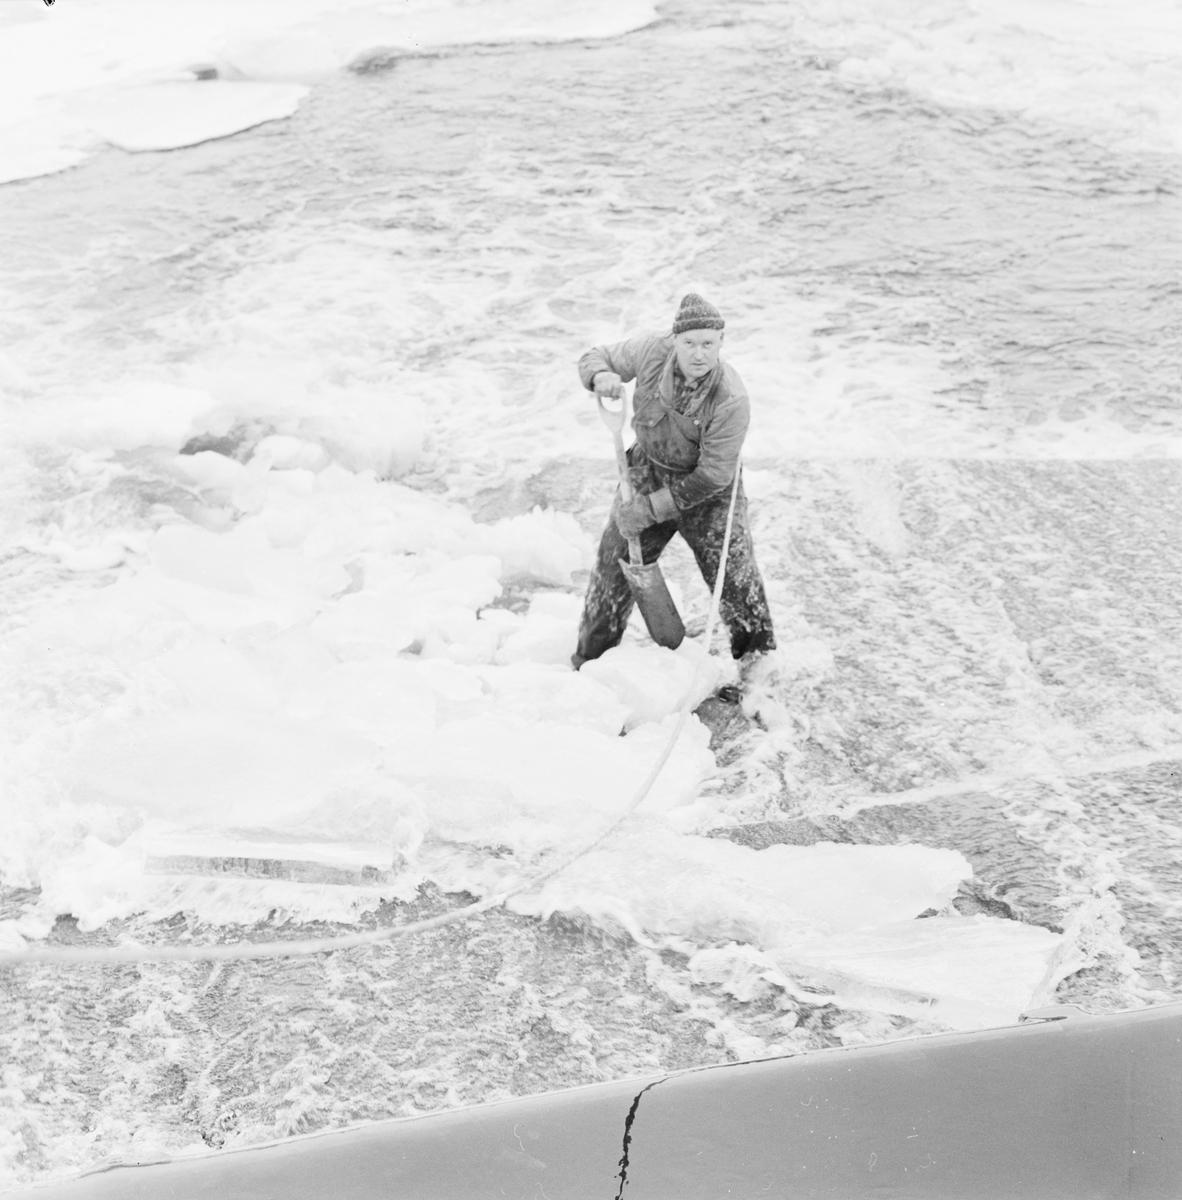 Islandsfallet - Kalle Westergren jobbar med isen, Uppsala december 1961